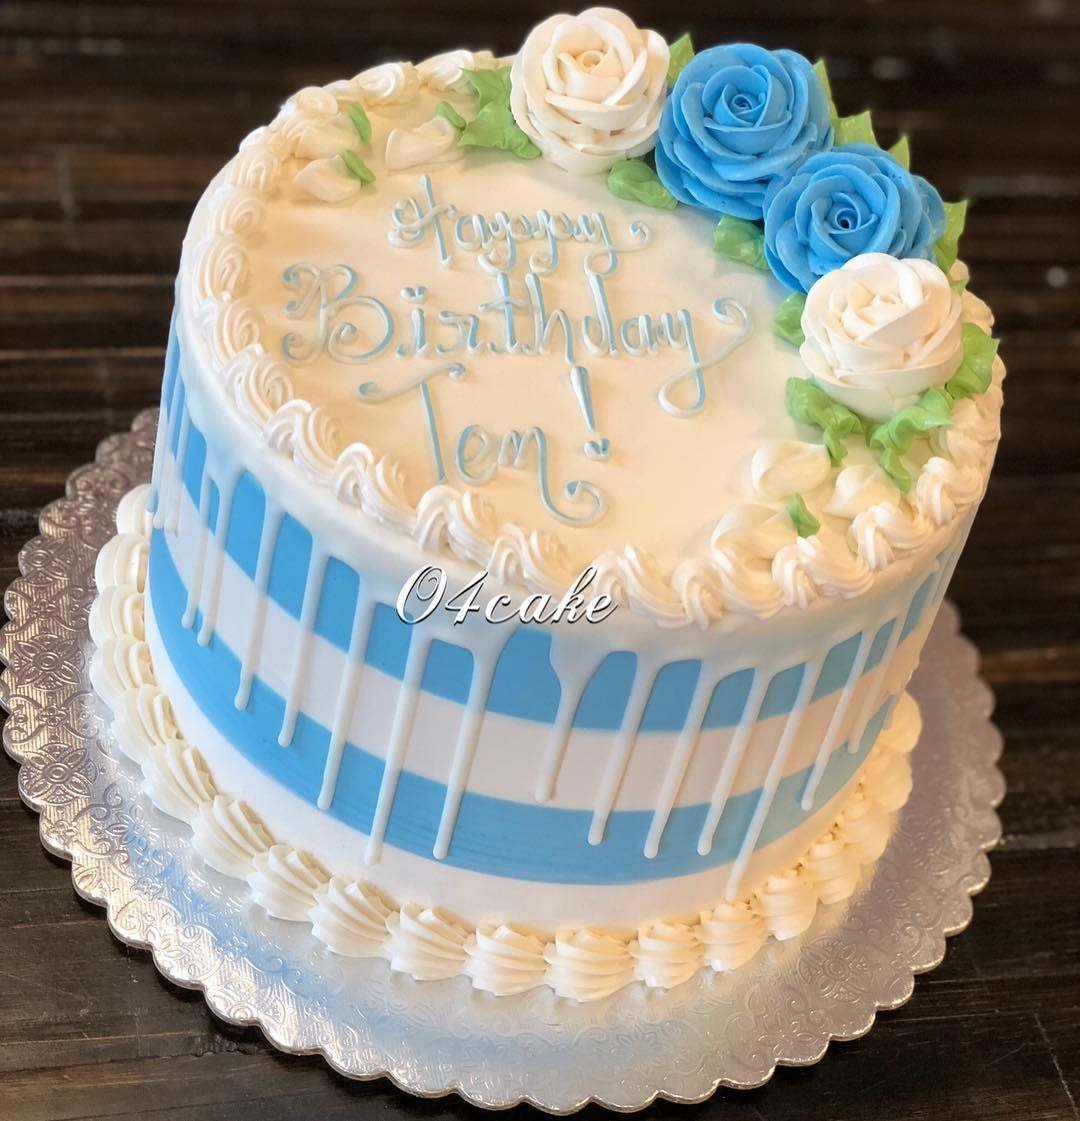 Chocolate sponge cake and rose cake decoration ...